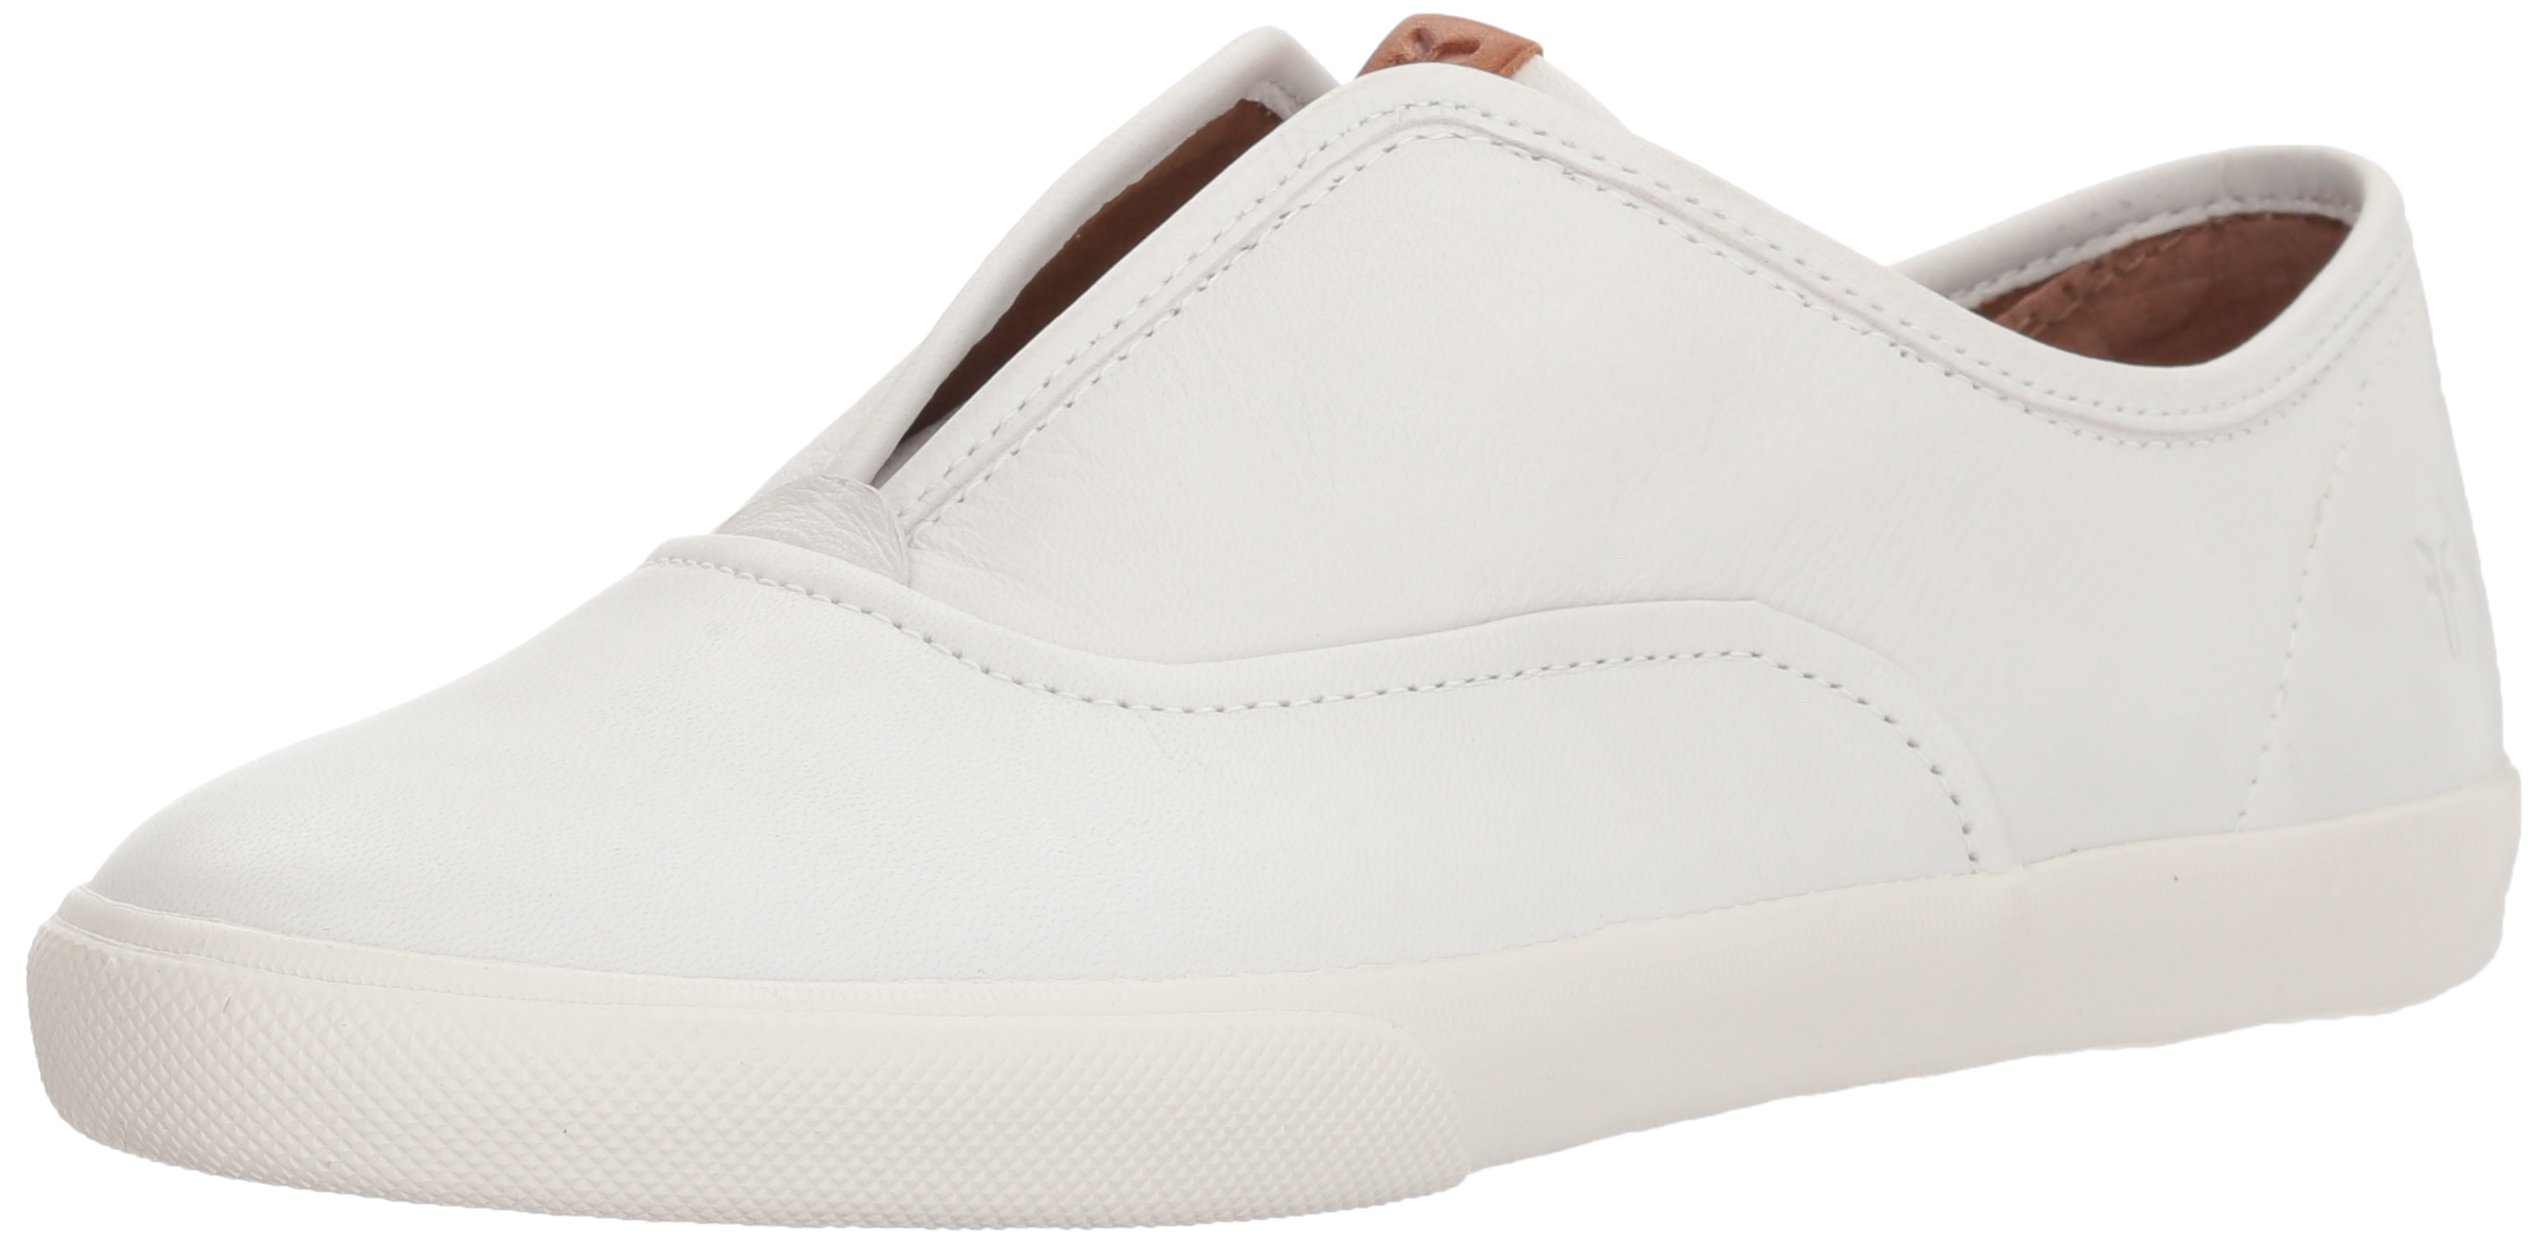 FRYE Women's Maya CVO Slip On Sneaker, White, 6 M US